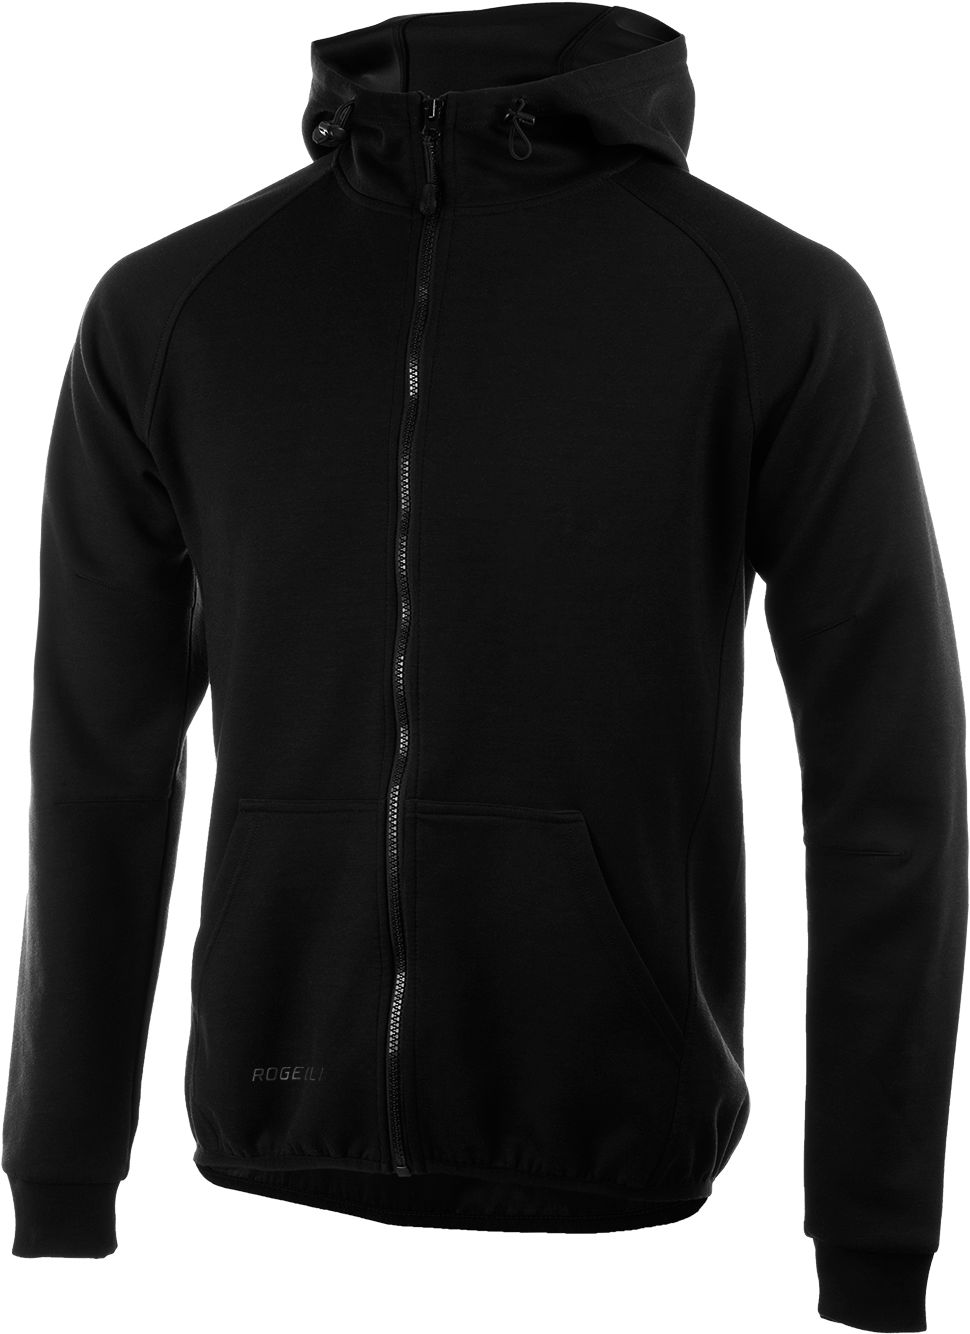 ROGELLI bluza męska z kapturem TRENING czarna Rozmiar: XL,050.601.XL